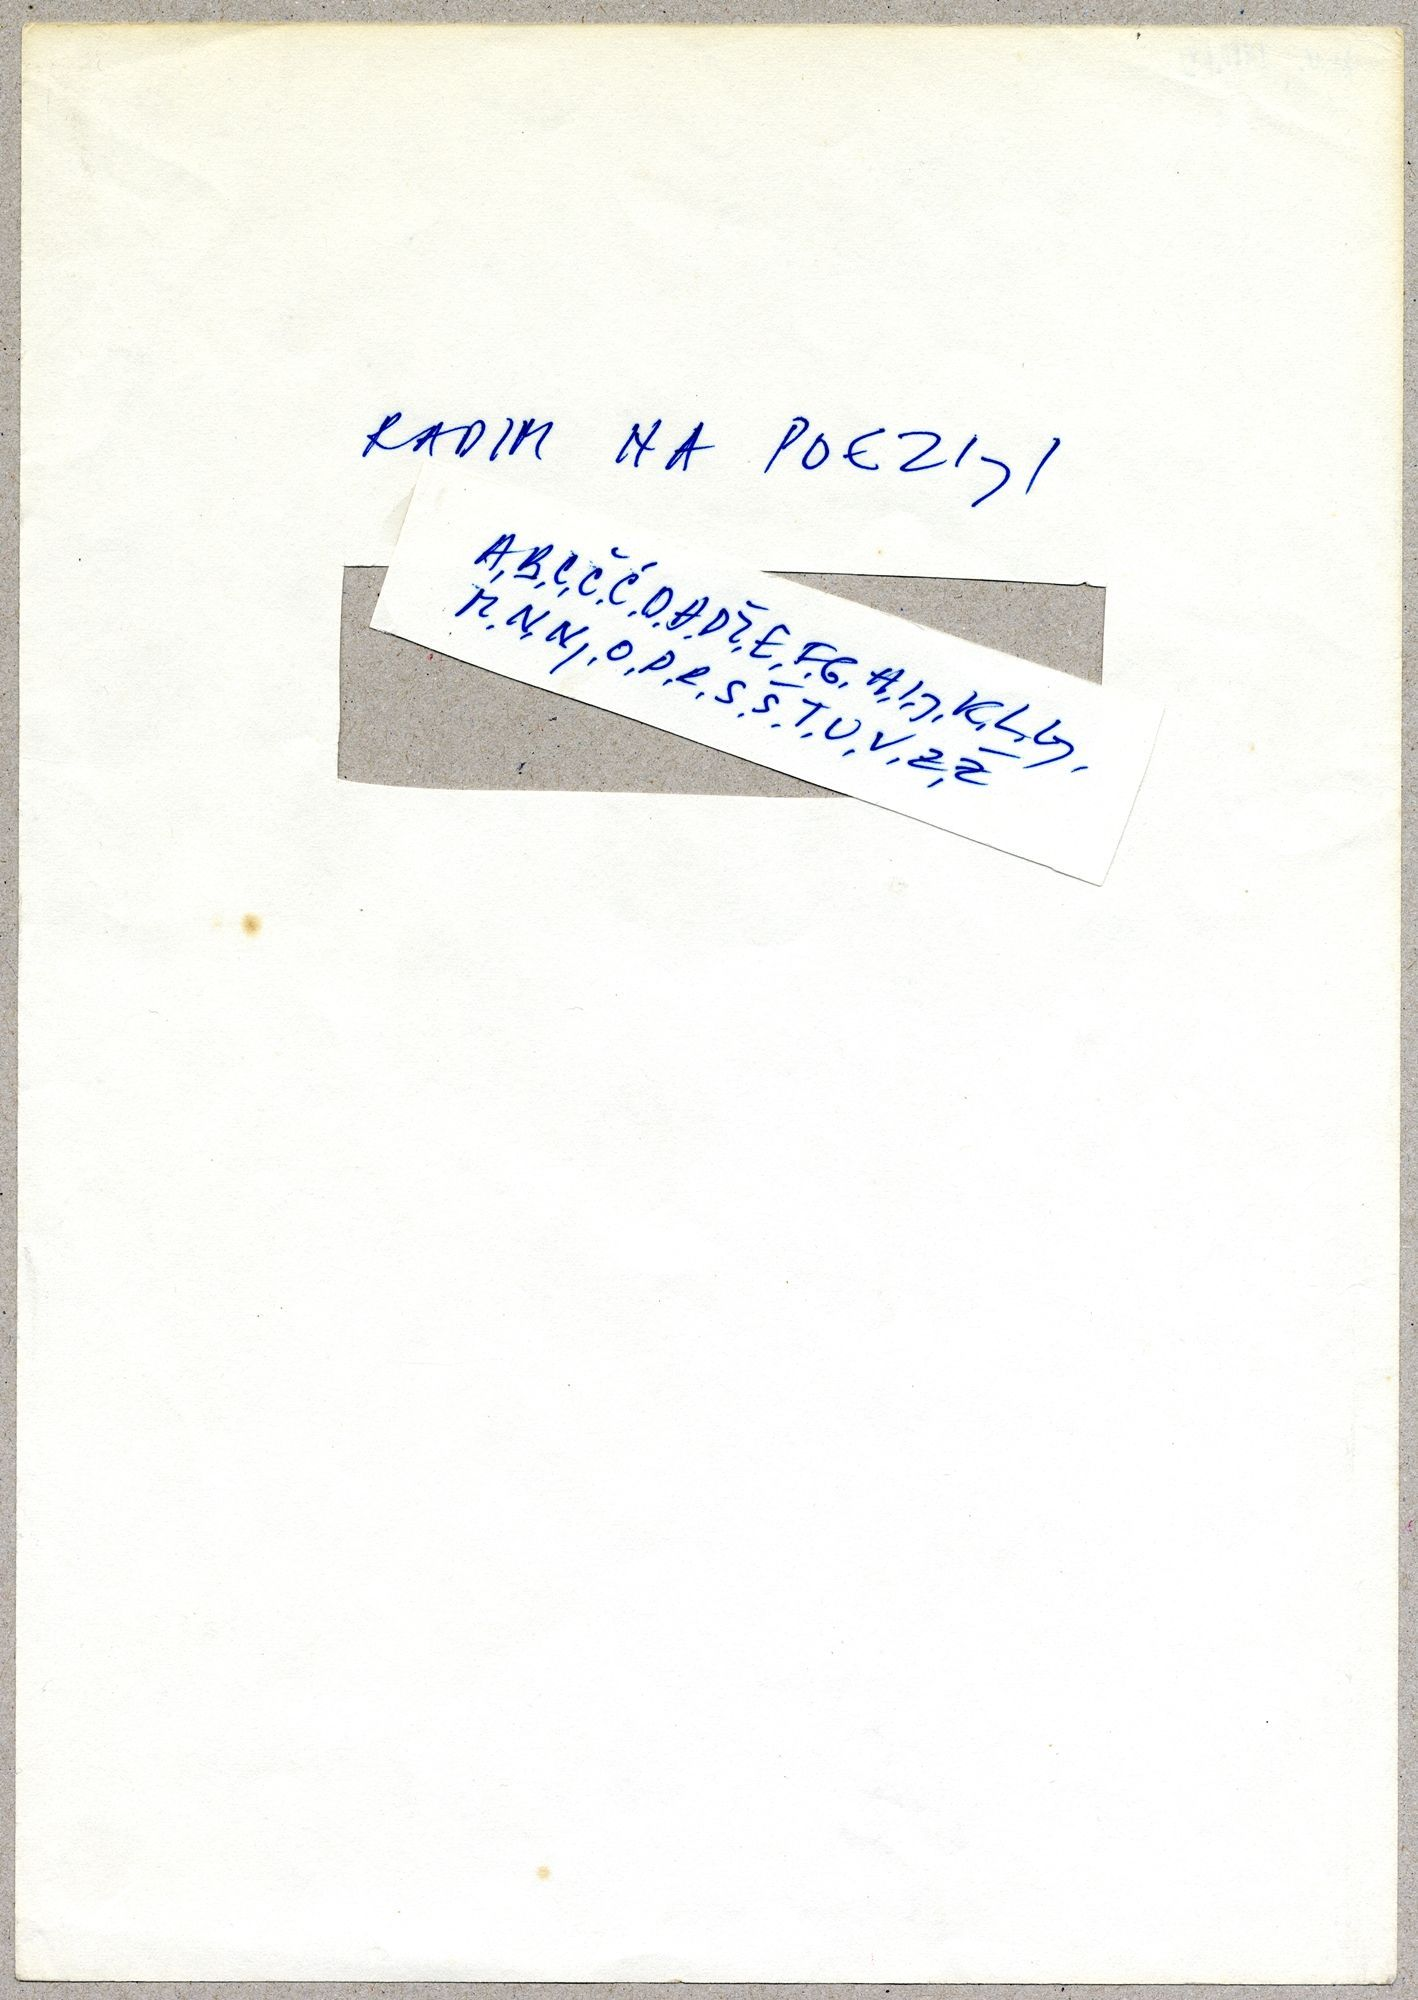 Vlado Martek Radim Na Poeziji Abeceda With Images Cards Against Humanity Museum Art